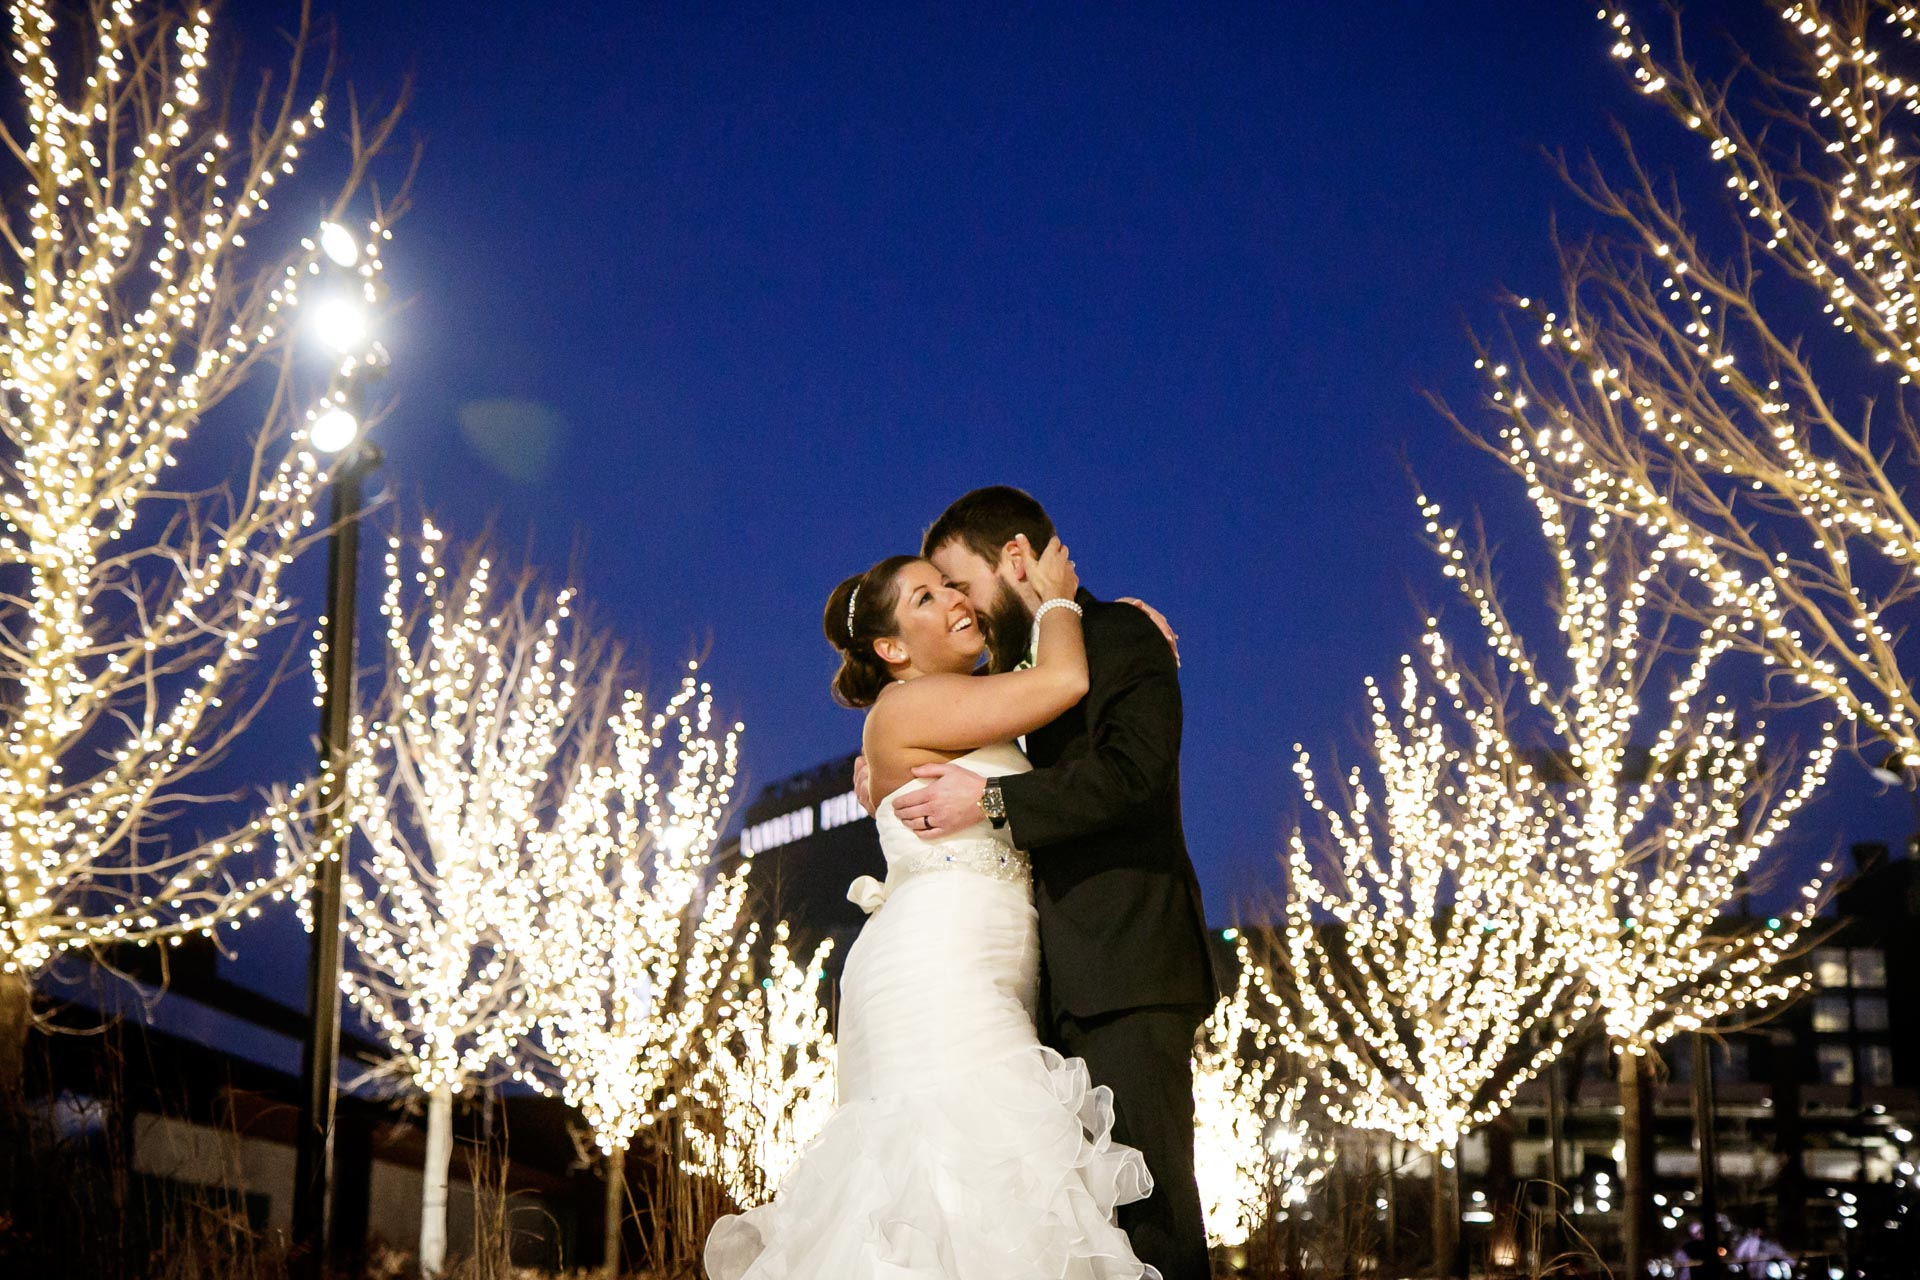 wedding-2-adam-shea-photography-green-bay-appleton-neenah-photographer-20.jpg